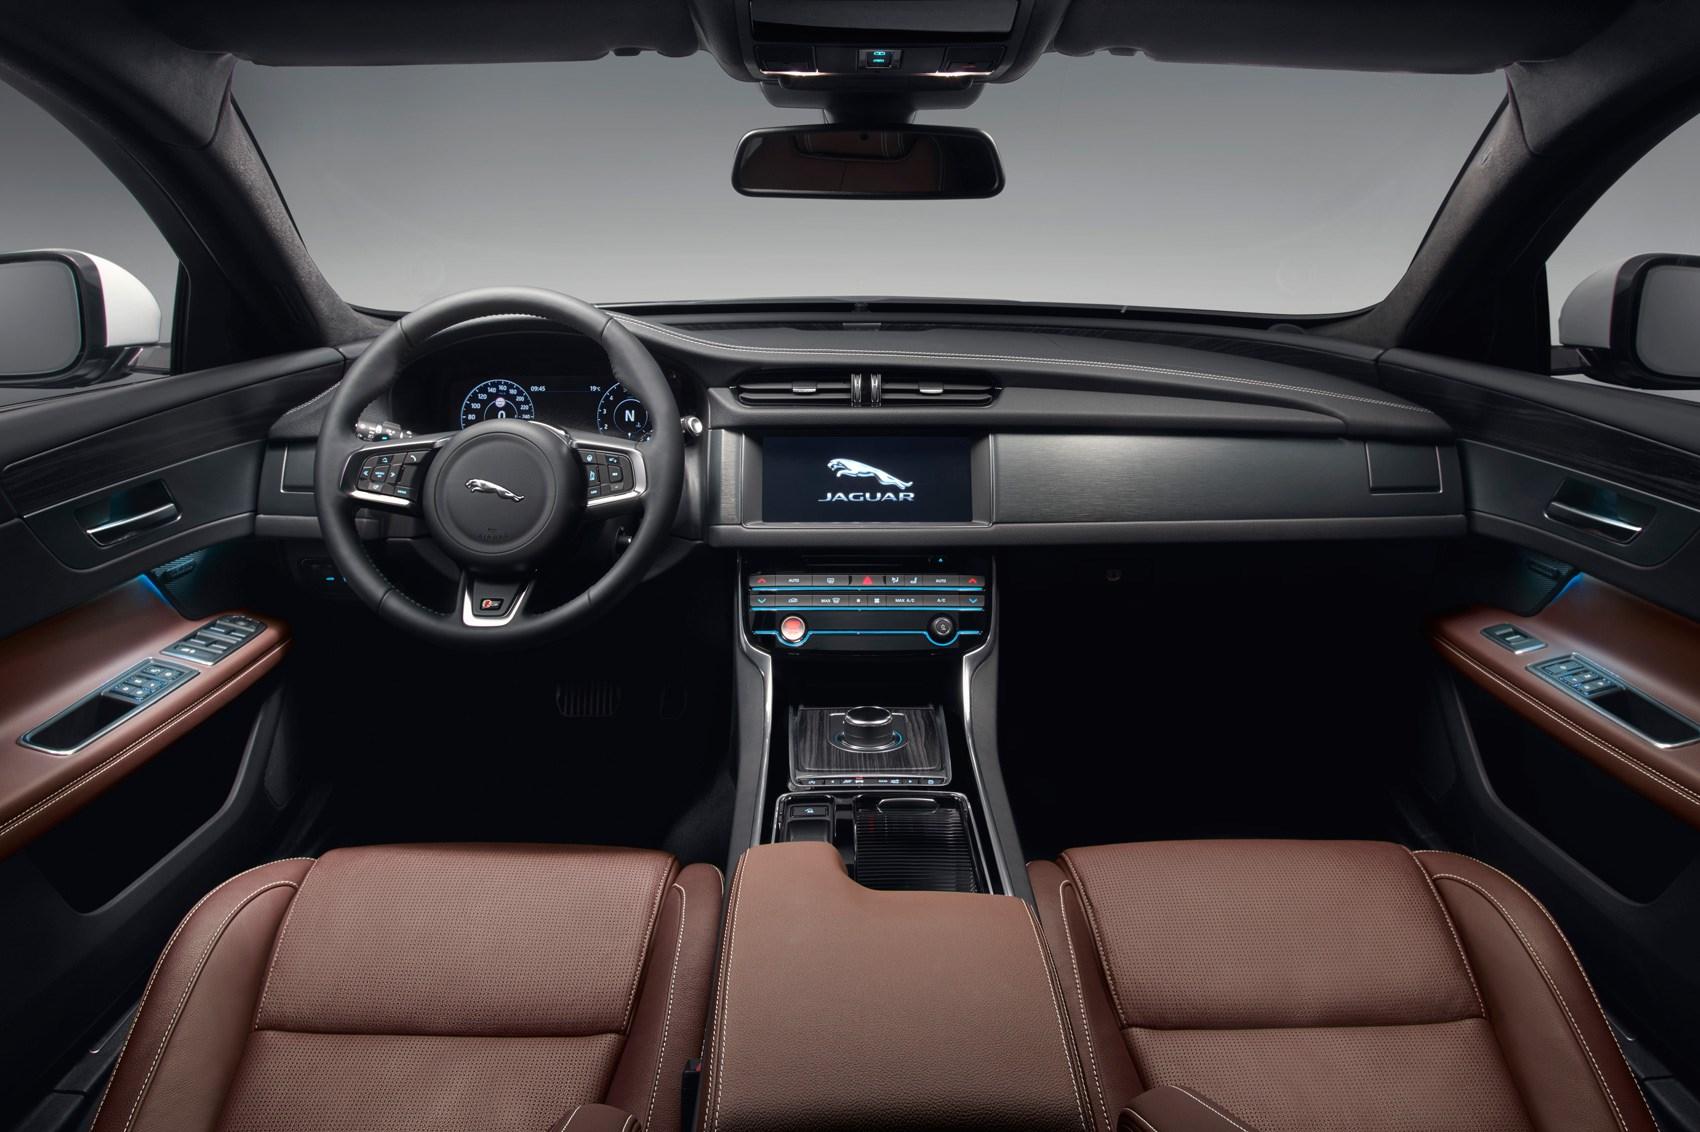 Jaguar XF Sportbrake revealed in full by CAR Magazine